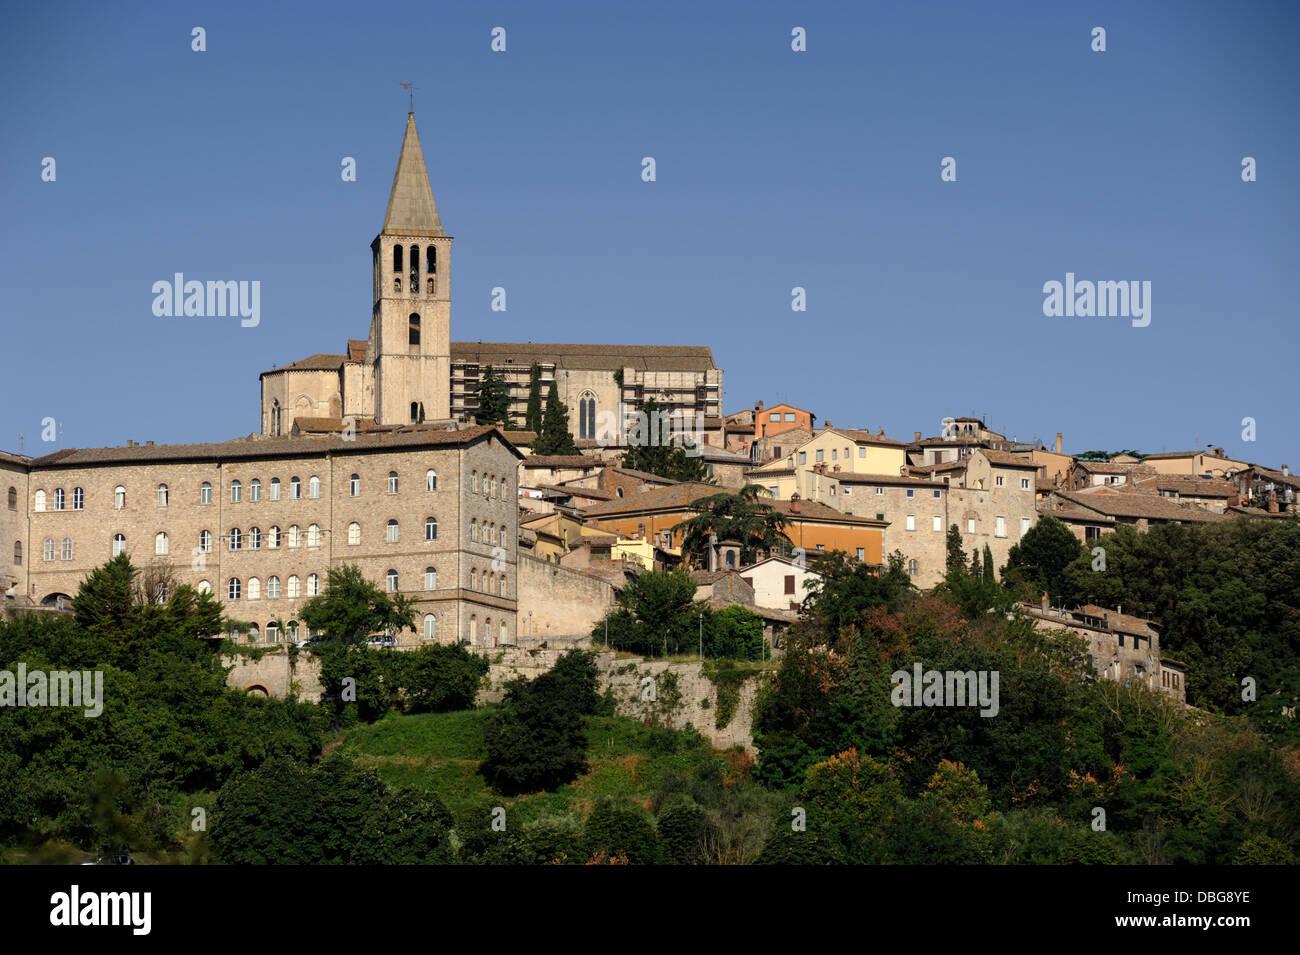 italy, umbria, todi - Stock Image